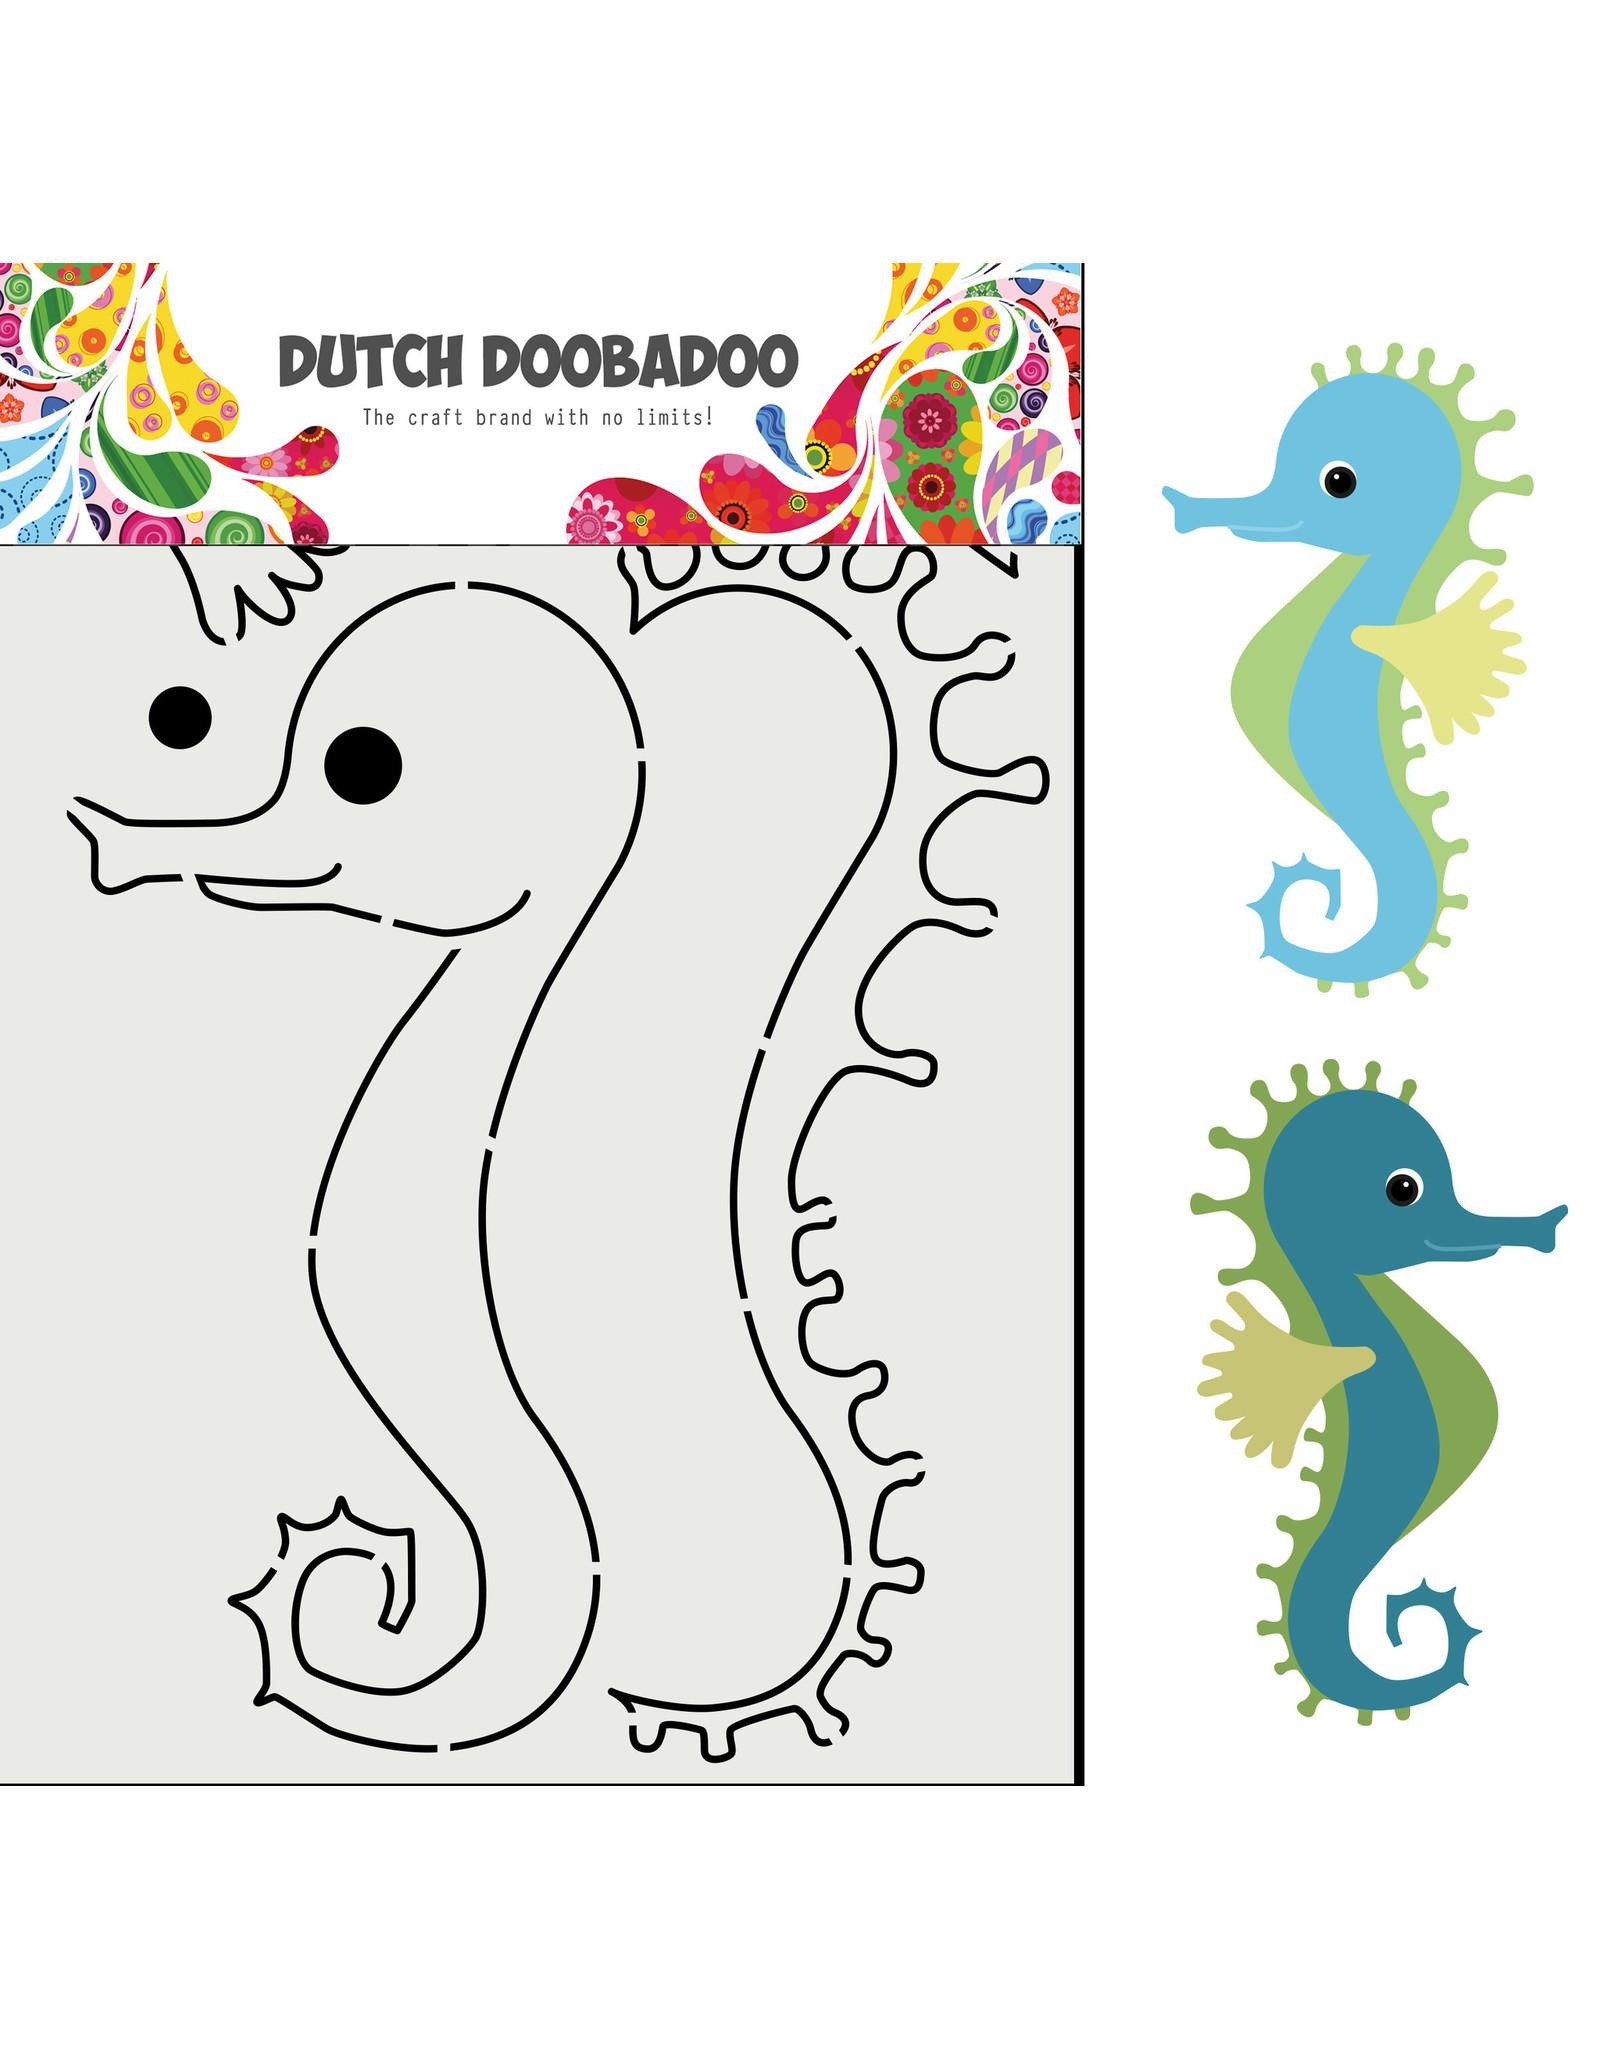 Dutch Doobadoo DDBD Card Art Built up Zeepaard